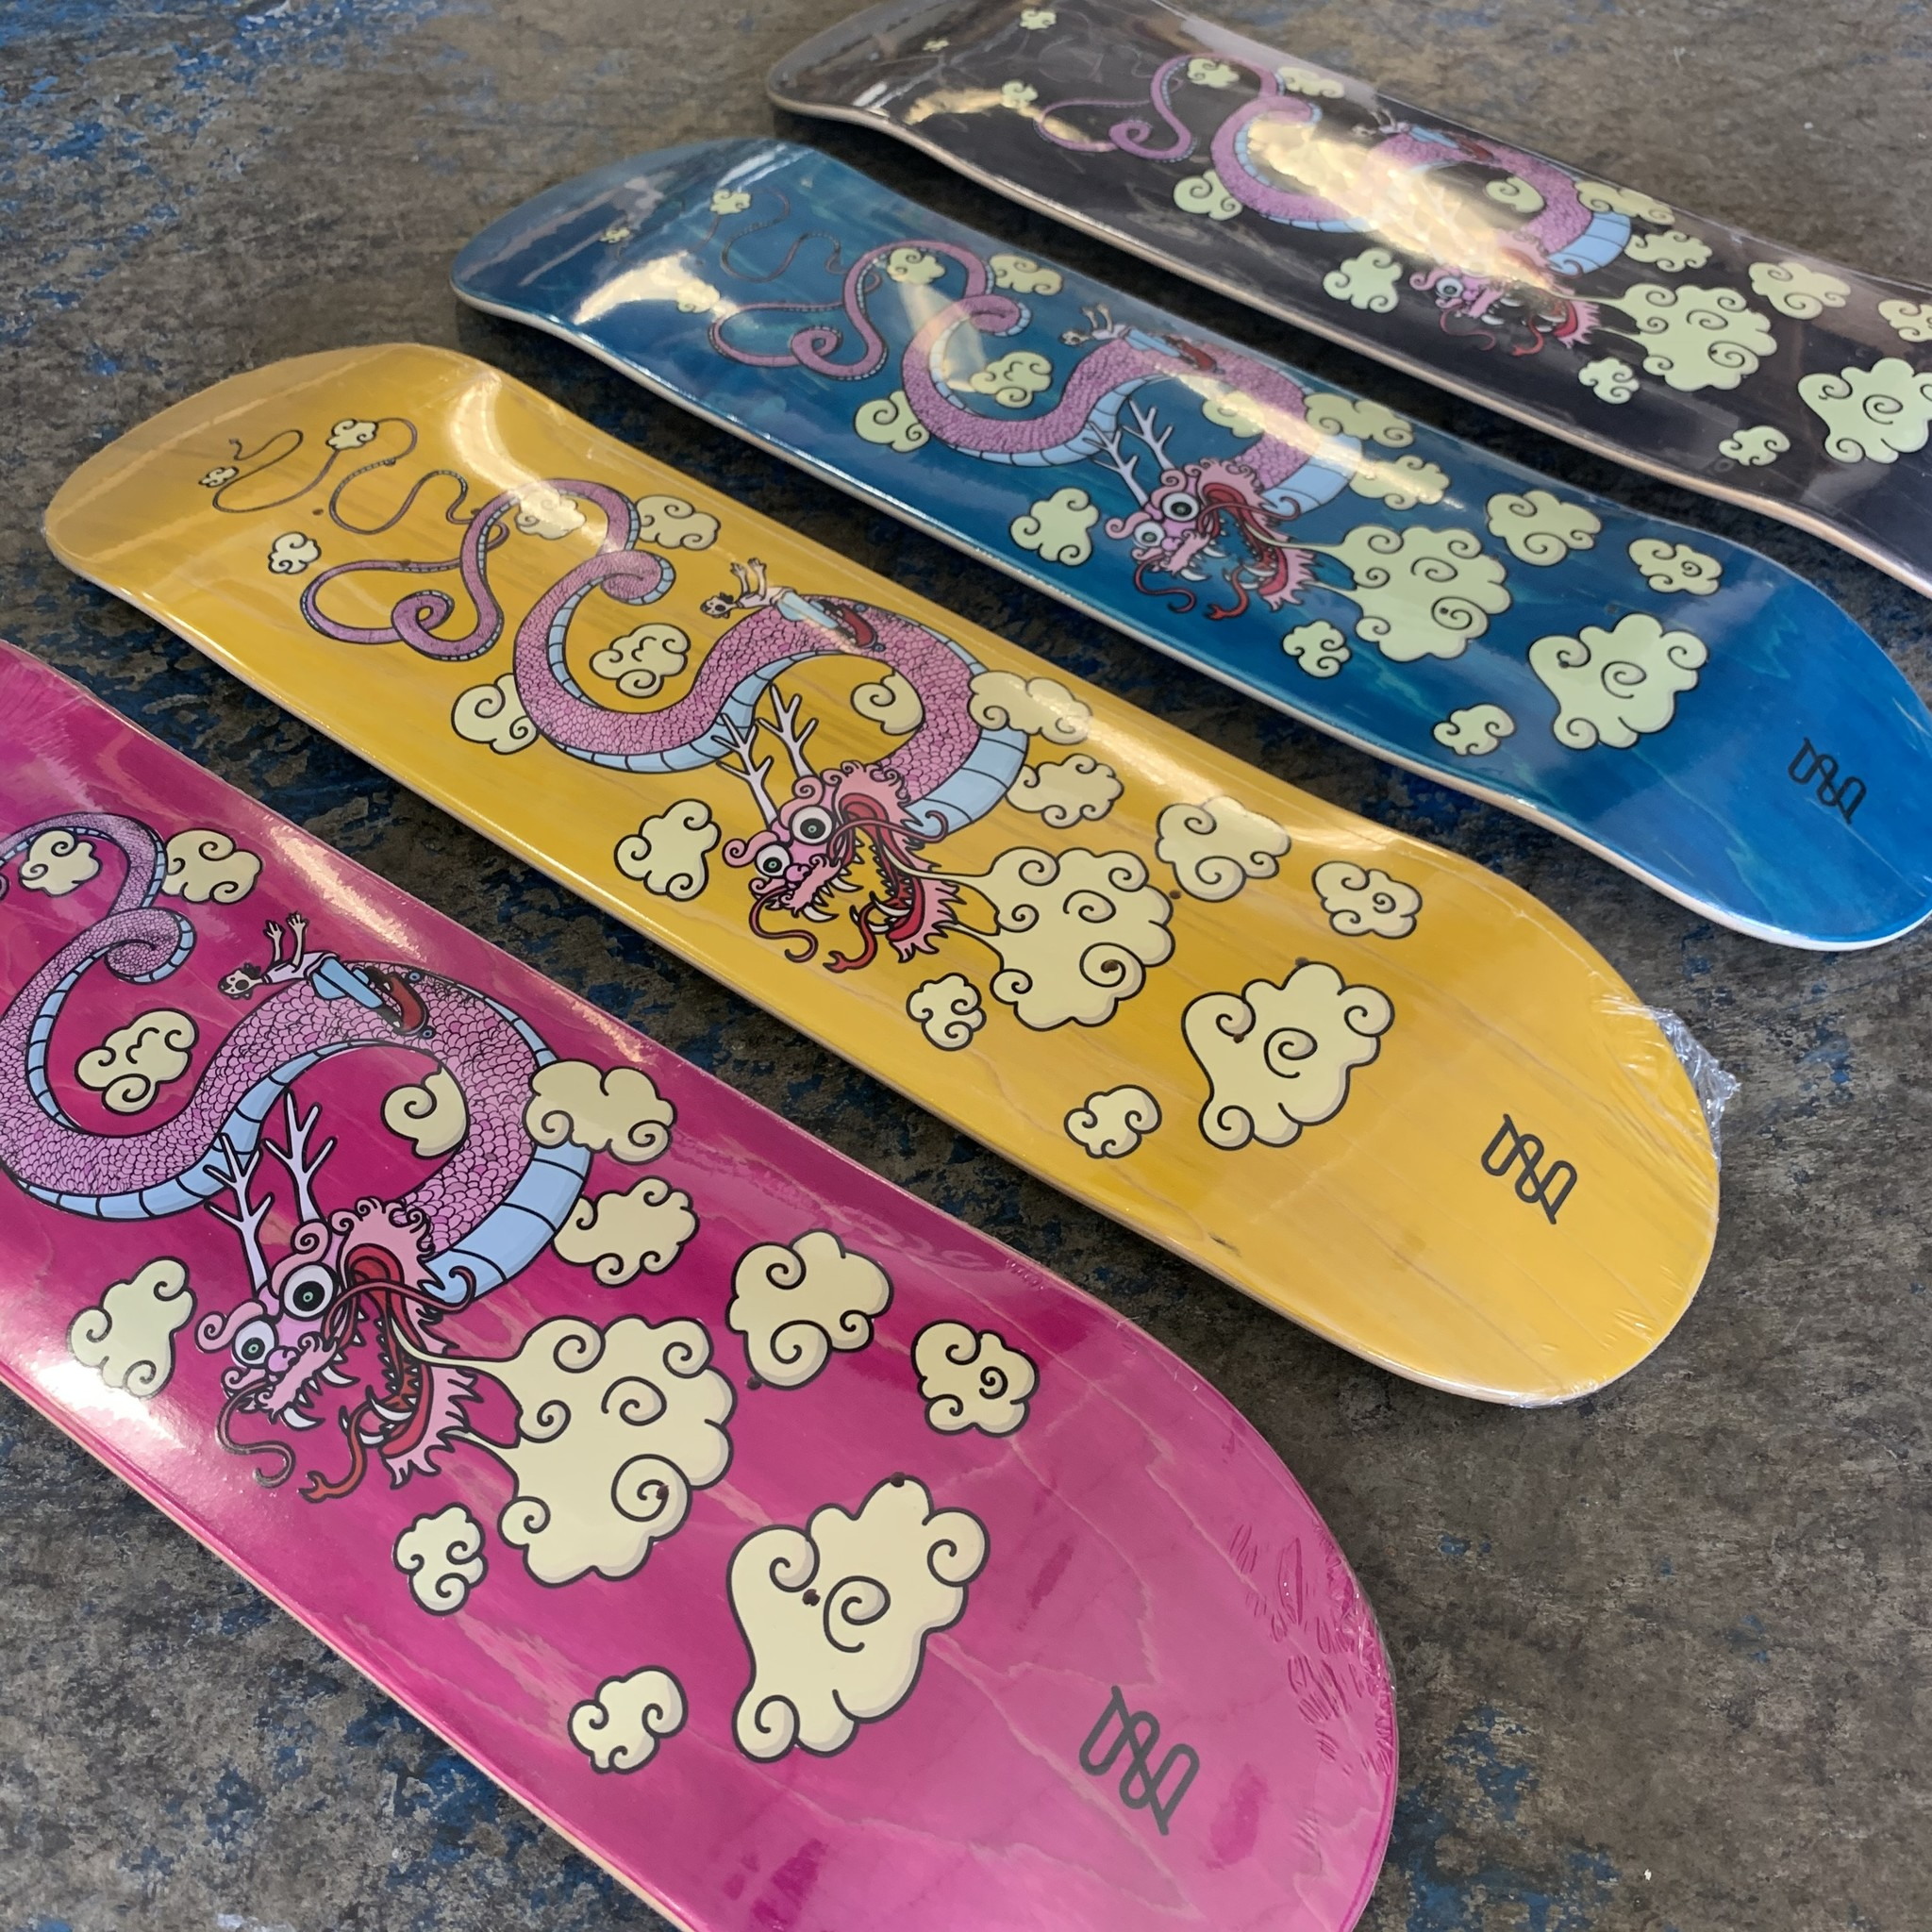 studio skate supply chartoonz dragon 8.25 deck